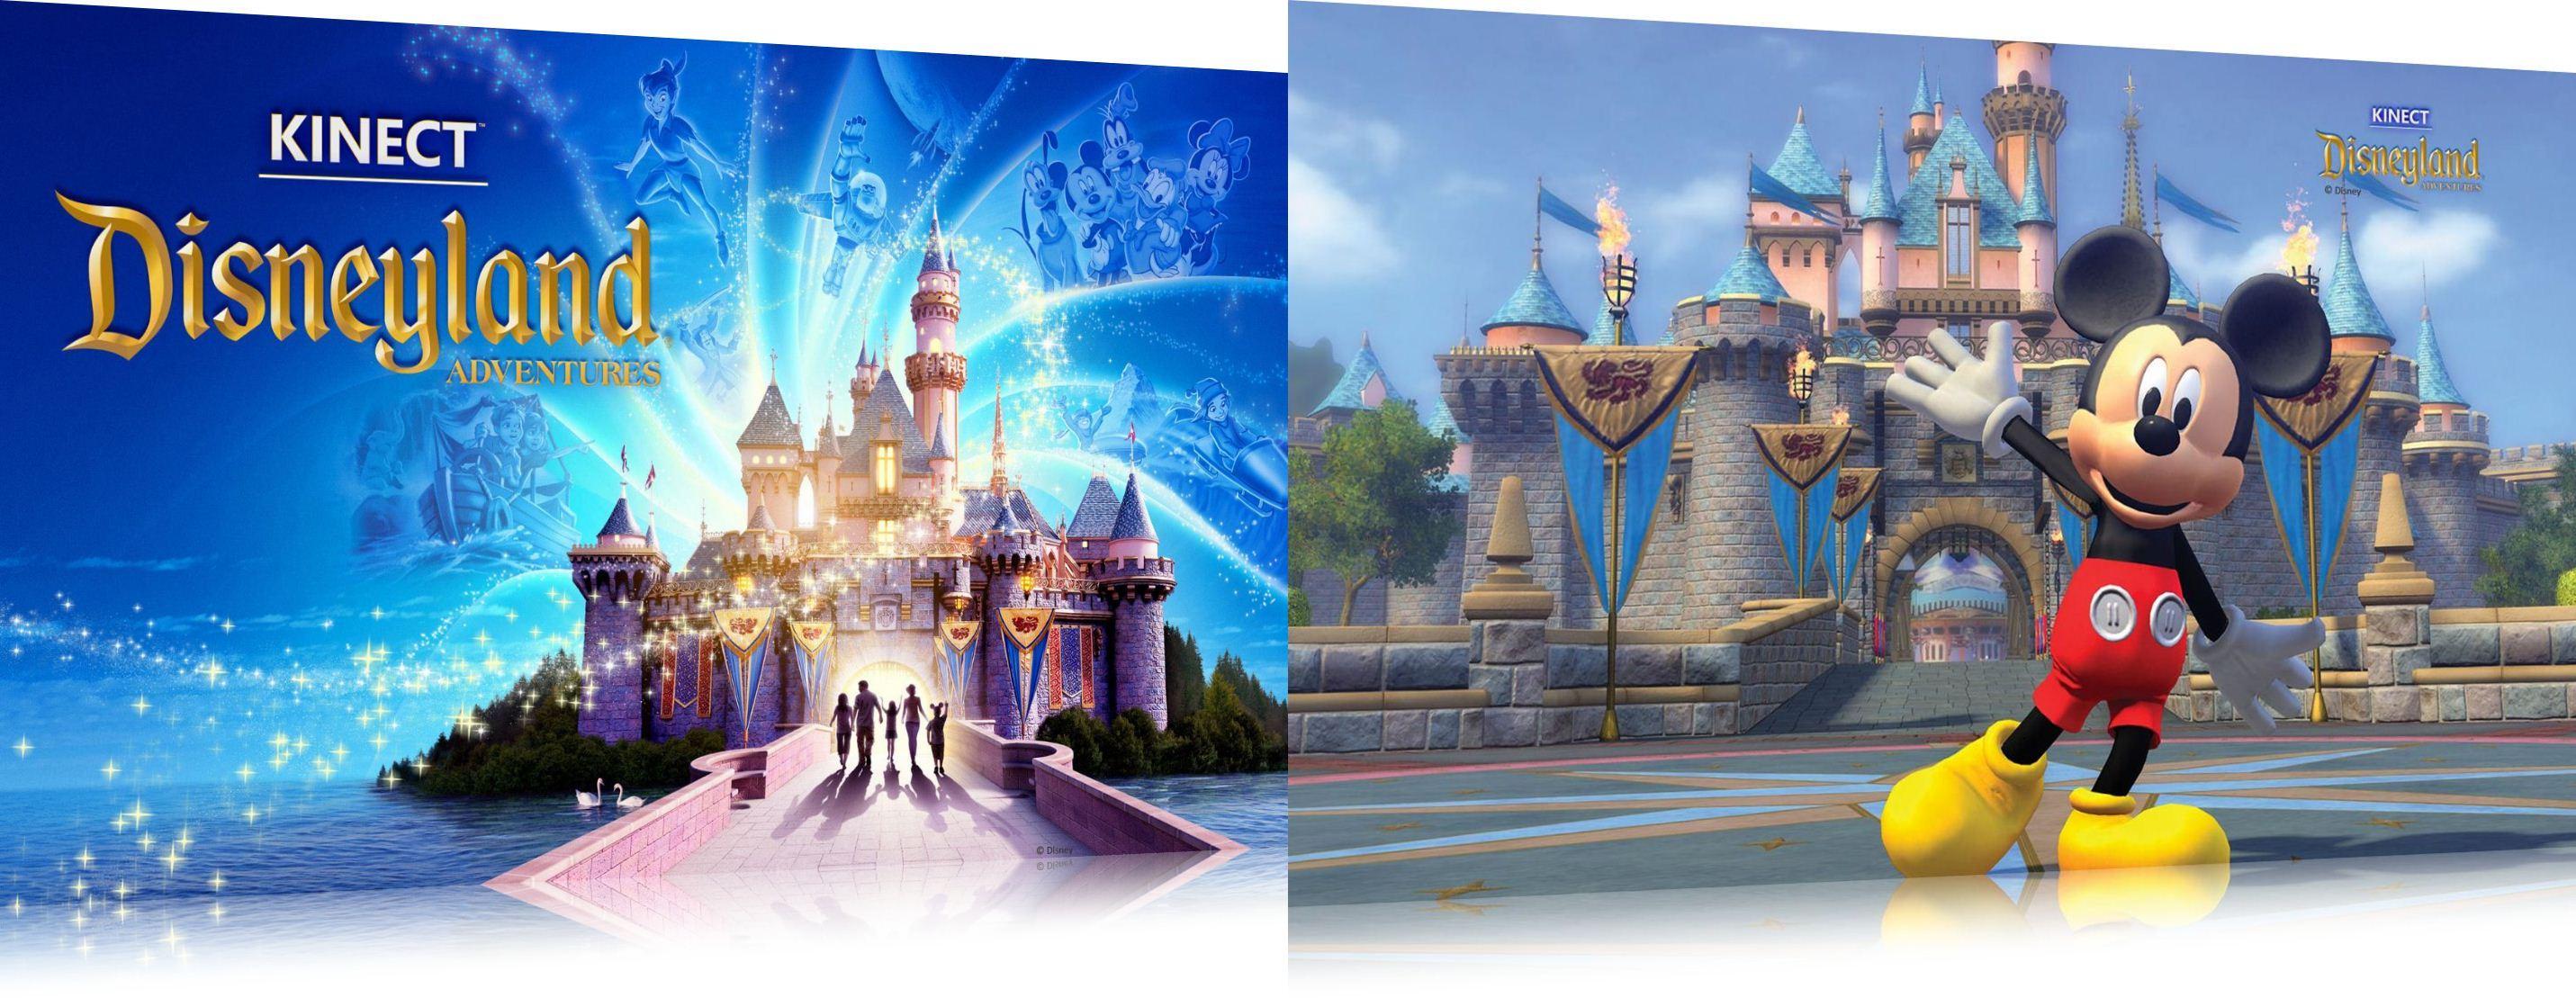 Kinect: Disneyland Adventures Theme - Imagem 1 do software